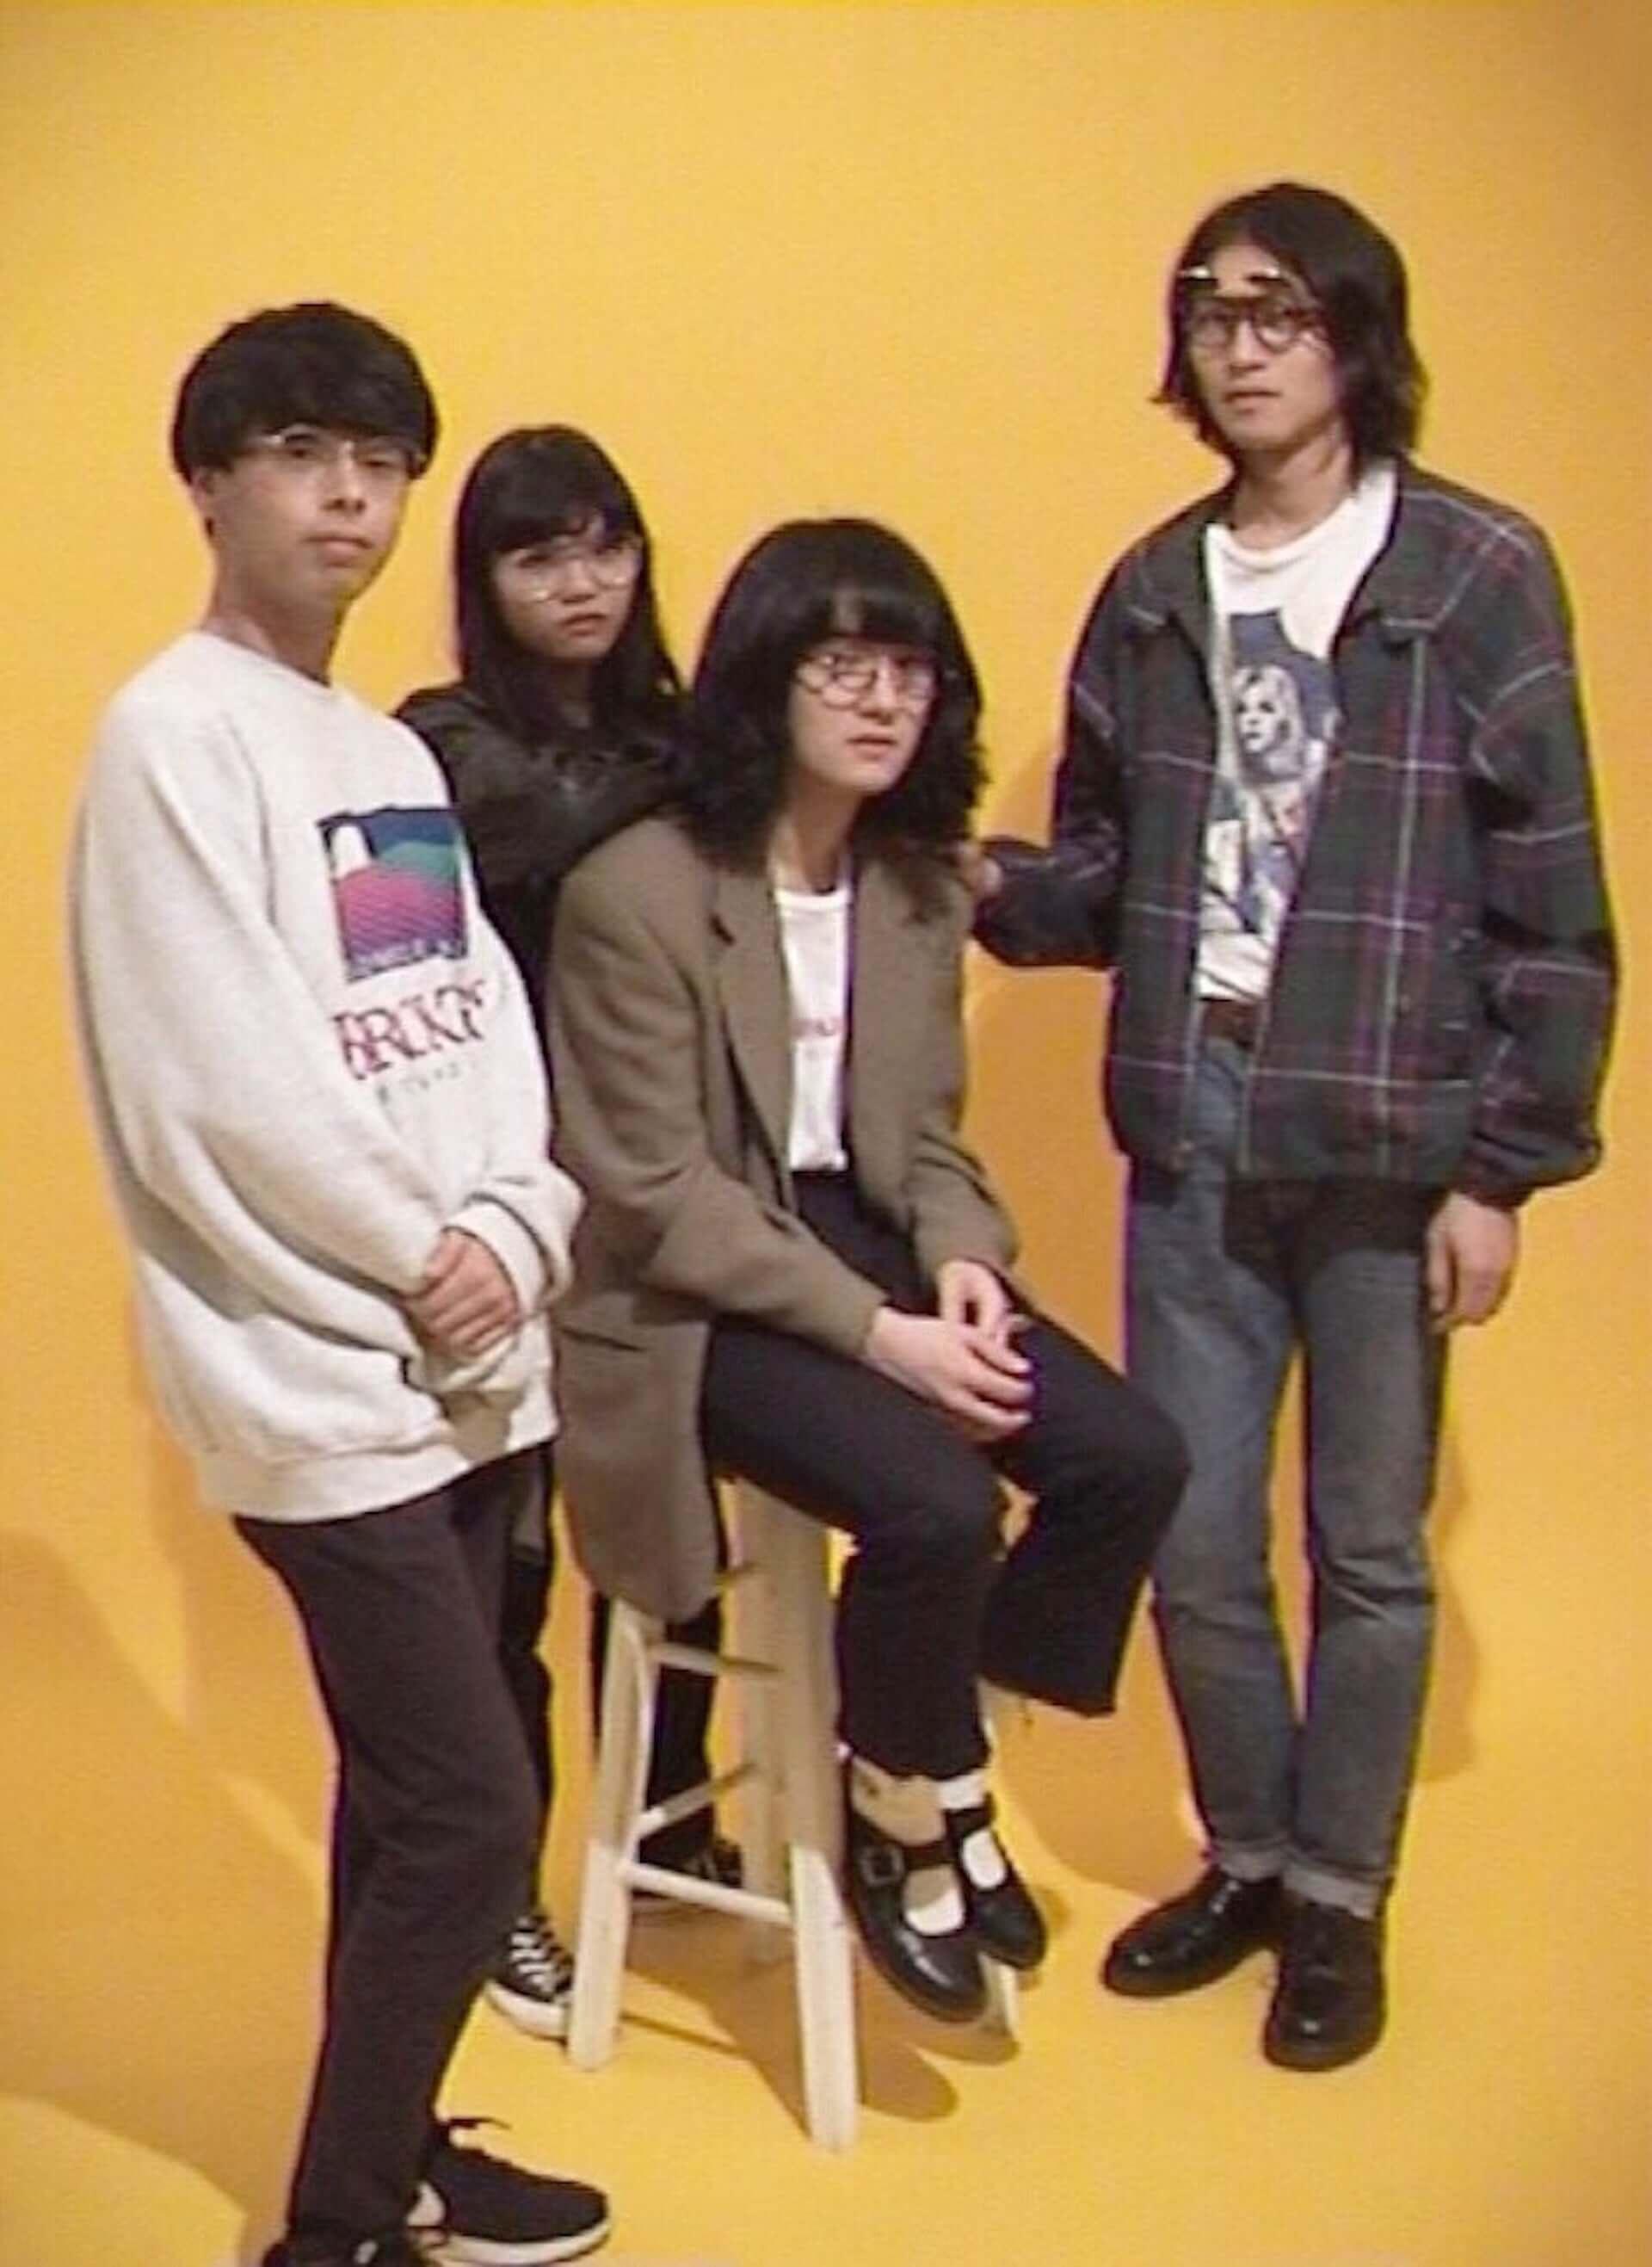 "gatoの1stアルバム『BAECUL』と""miss u""MV、最新アー写が本日解禁!渋谷WWWでのリリパにはNo Busesが出演決定 music201014_gato_3-1920x2634"